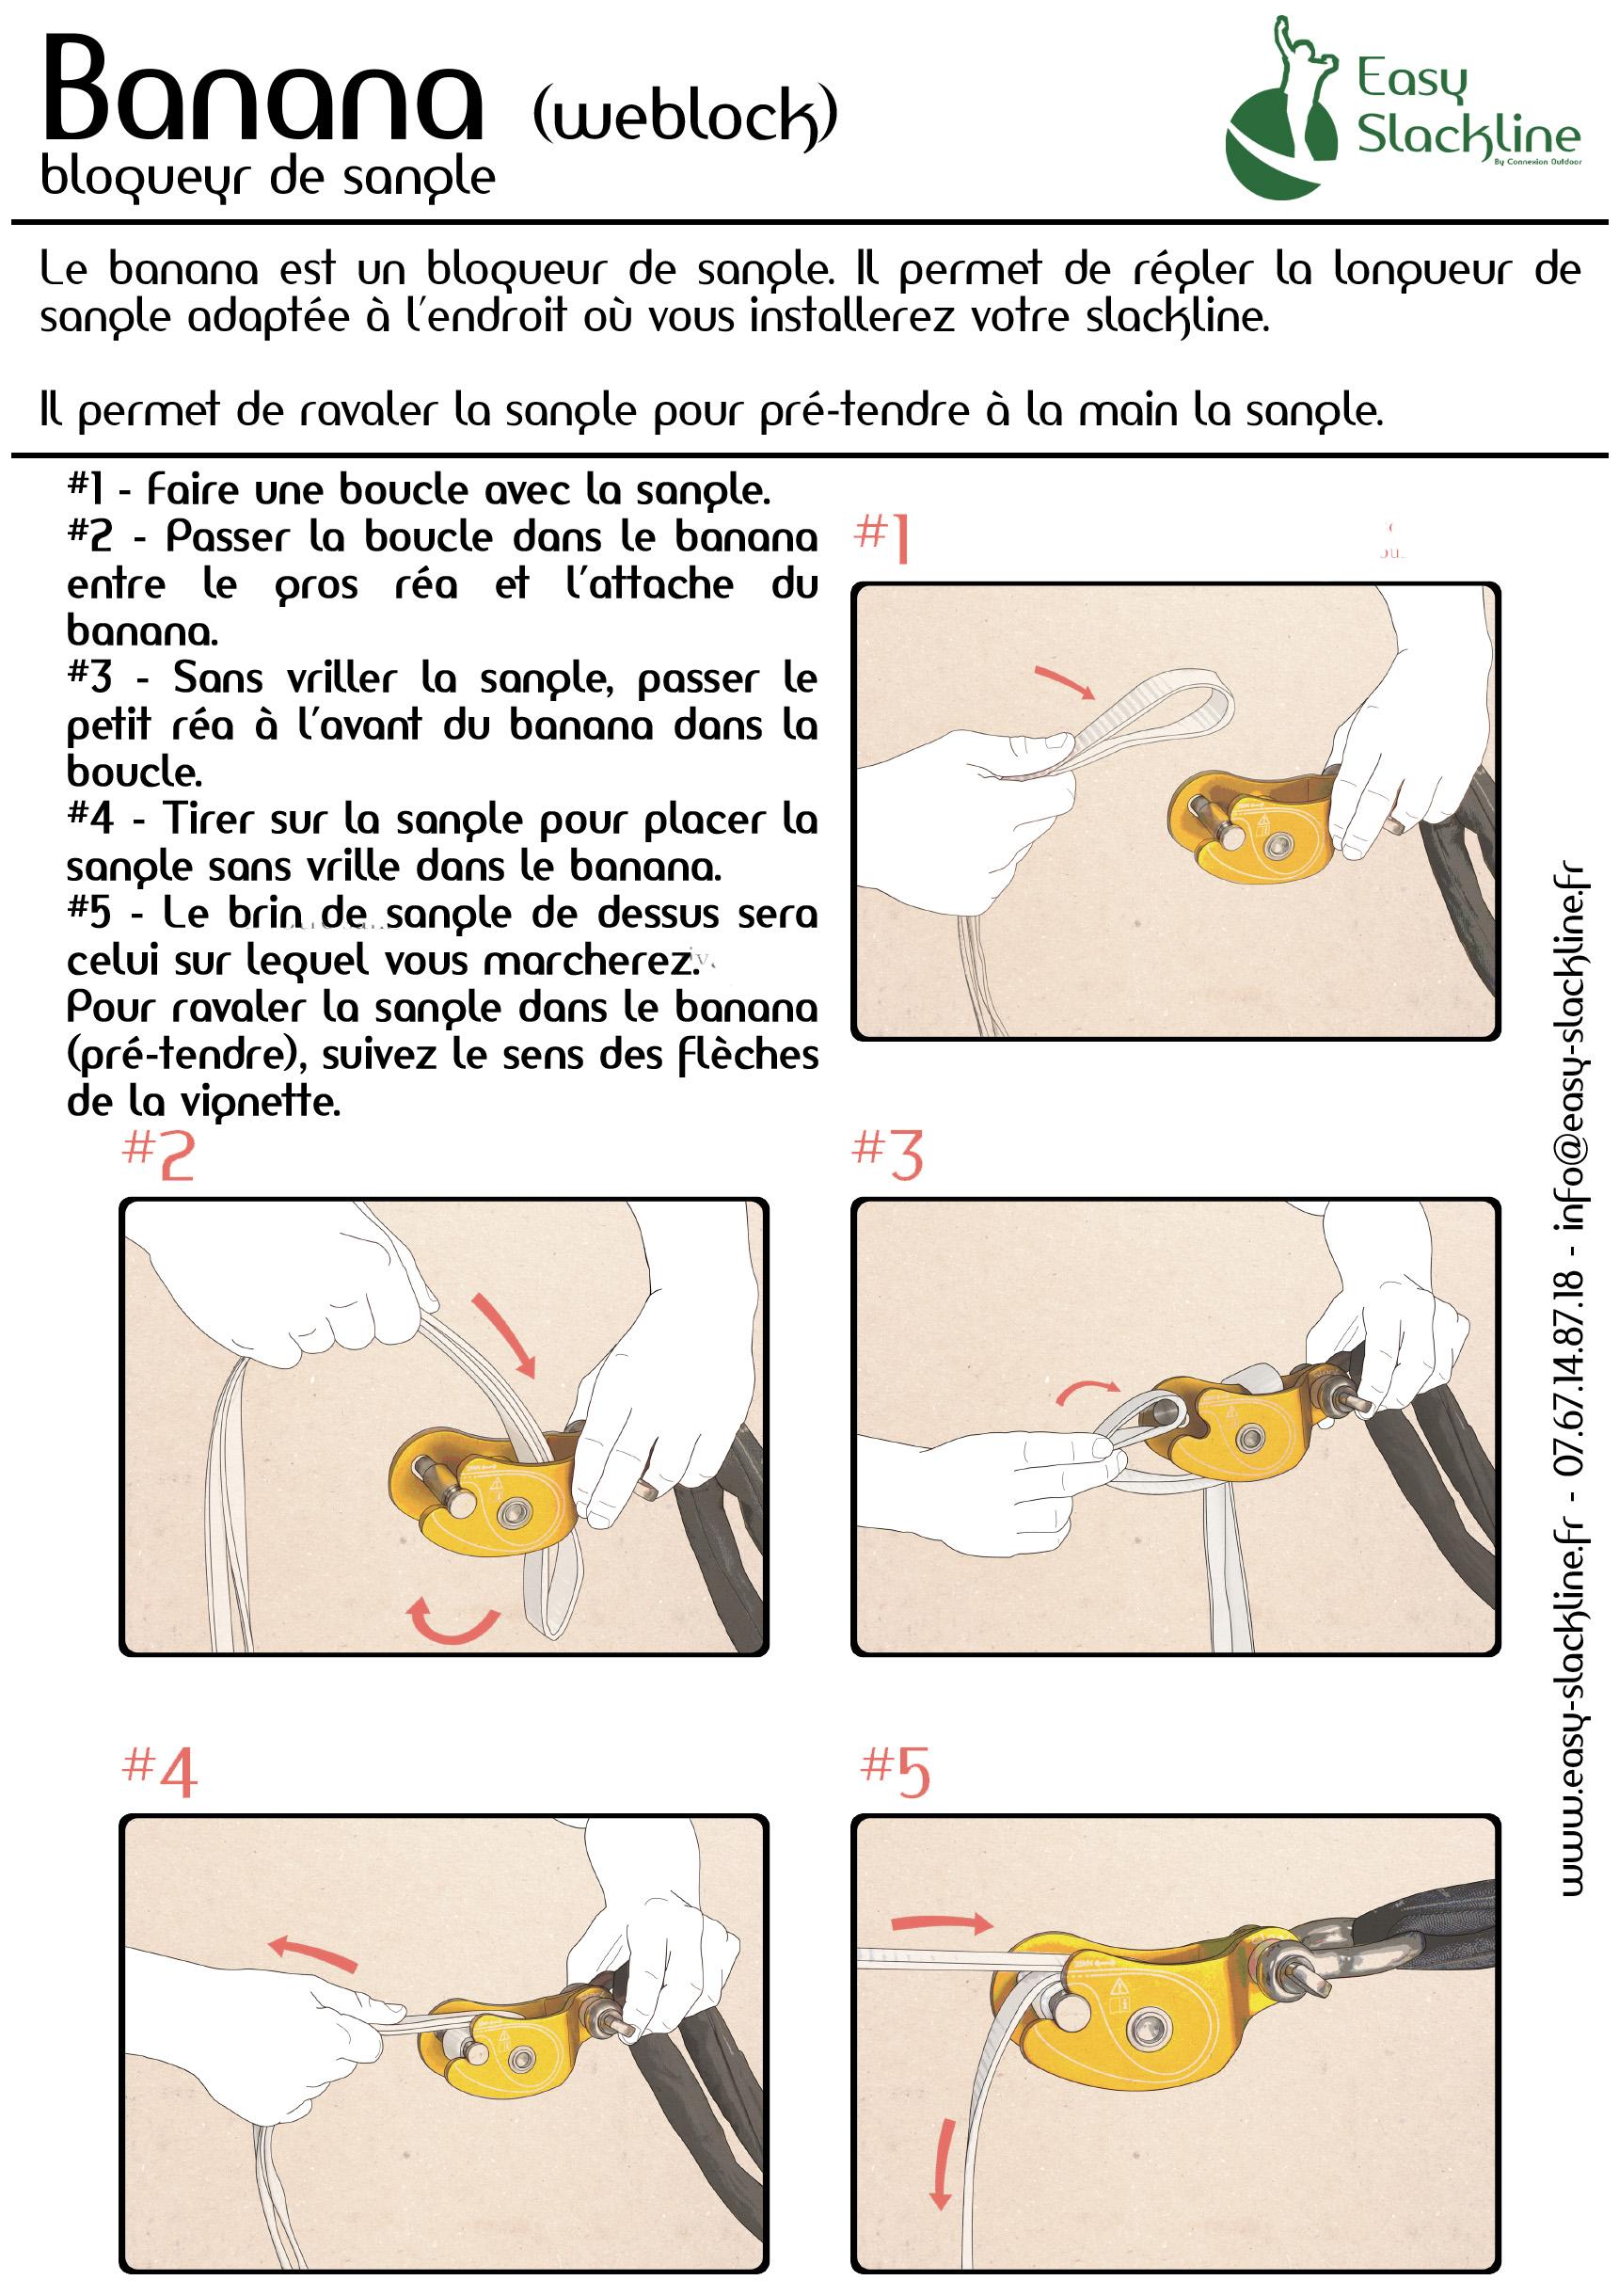 Installation d'un banana - bloqueur de sangle - Easy Slackline